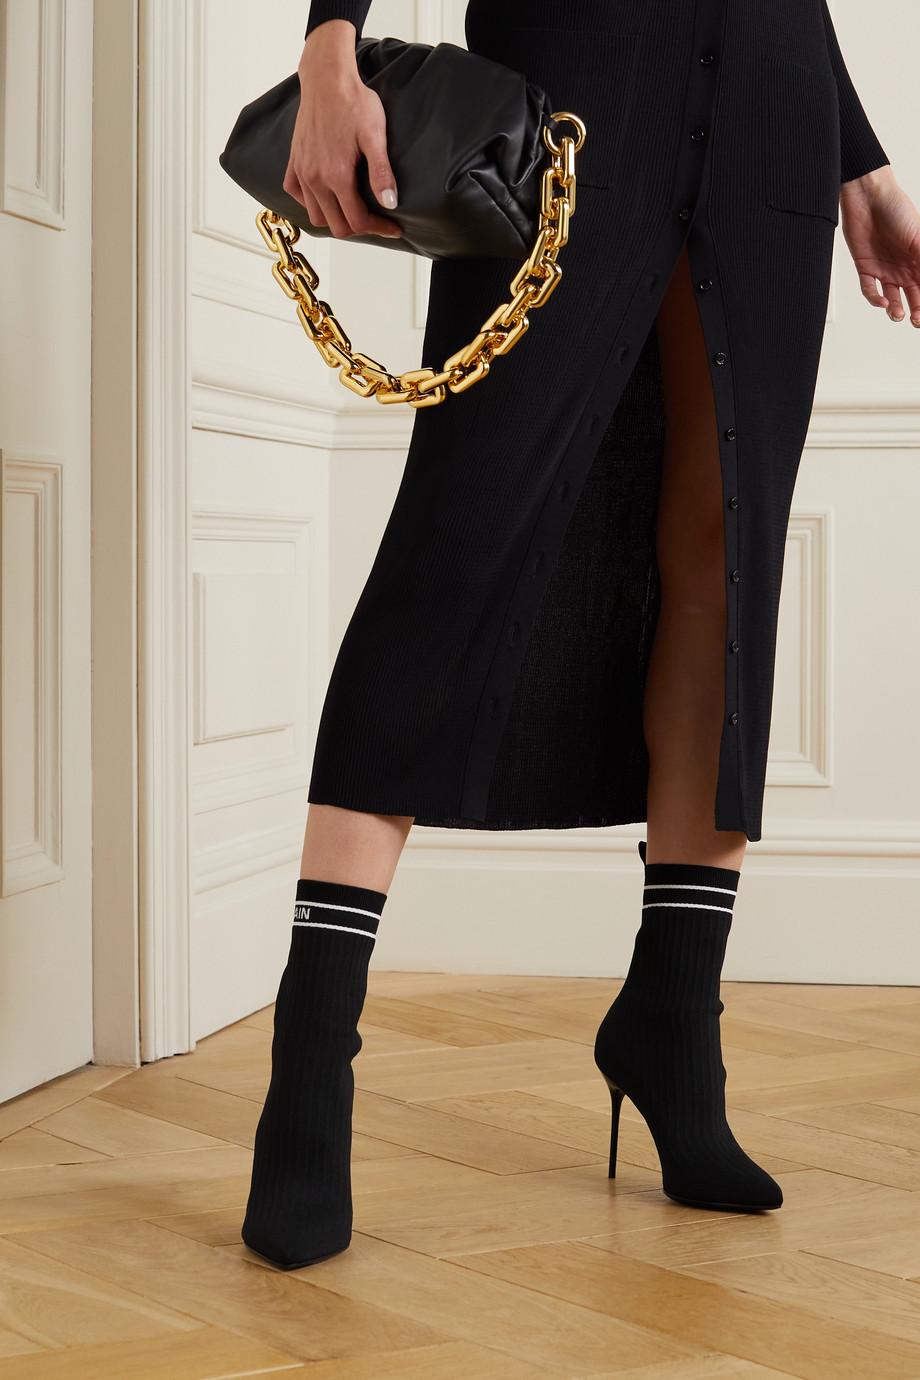 Balmain Skye Stiefel aus Stetch-Strick mit Logomuster